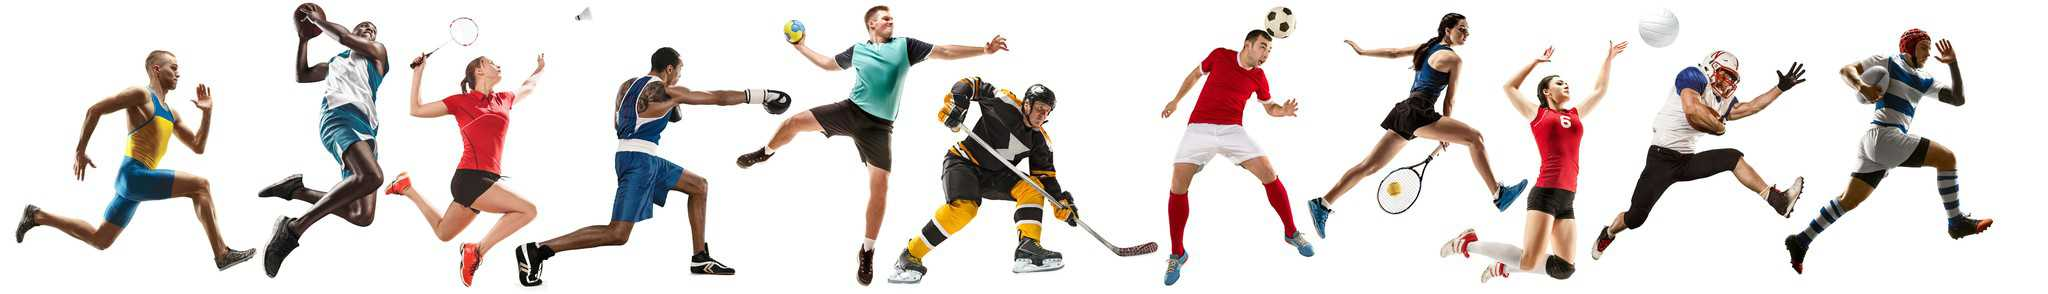 Sportutövare